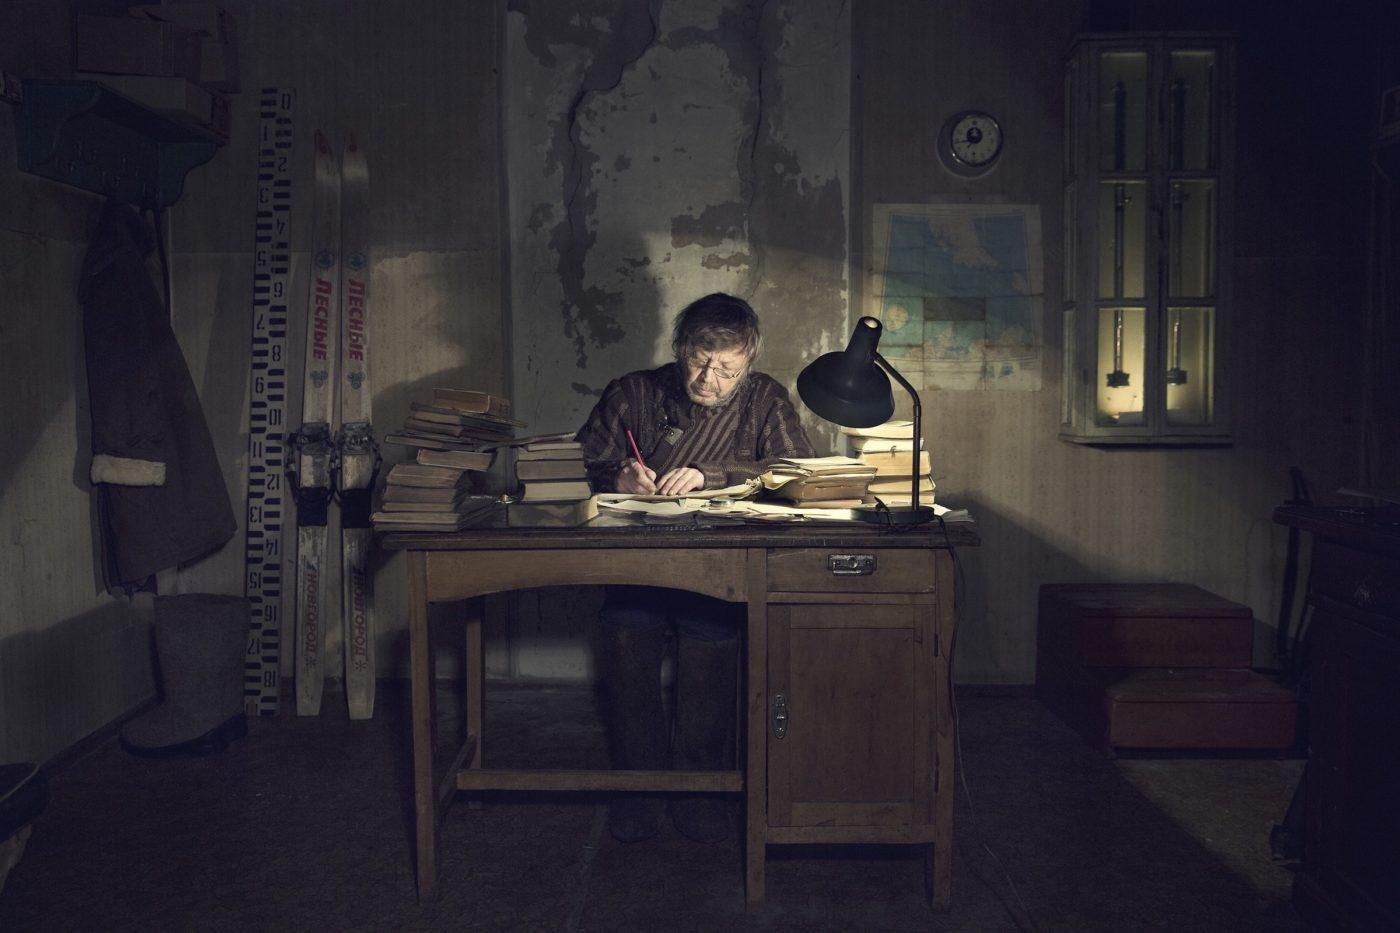 Man writing at desk, illuminated by desk lamp